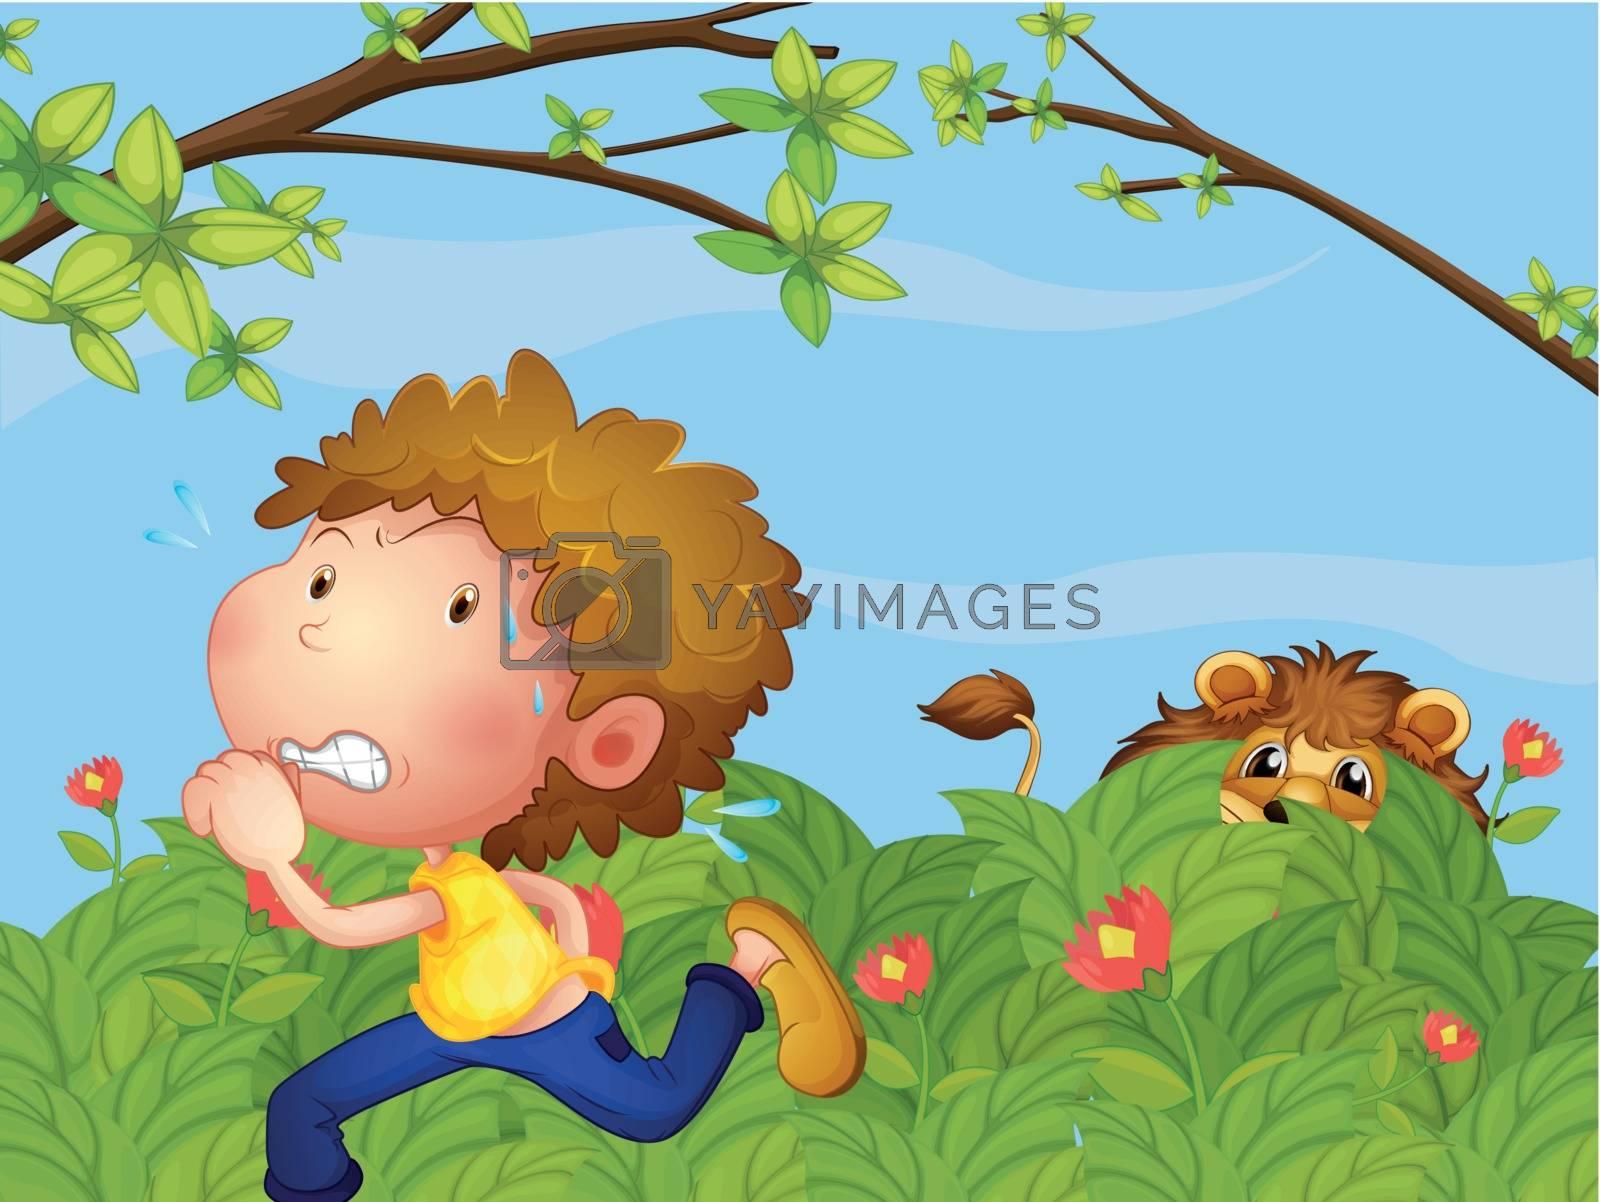 Illustration of a scared boy running